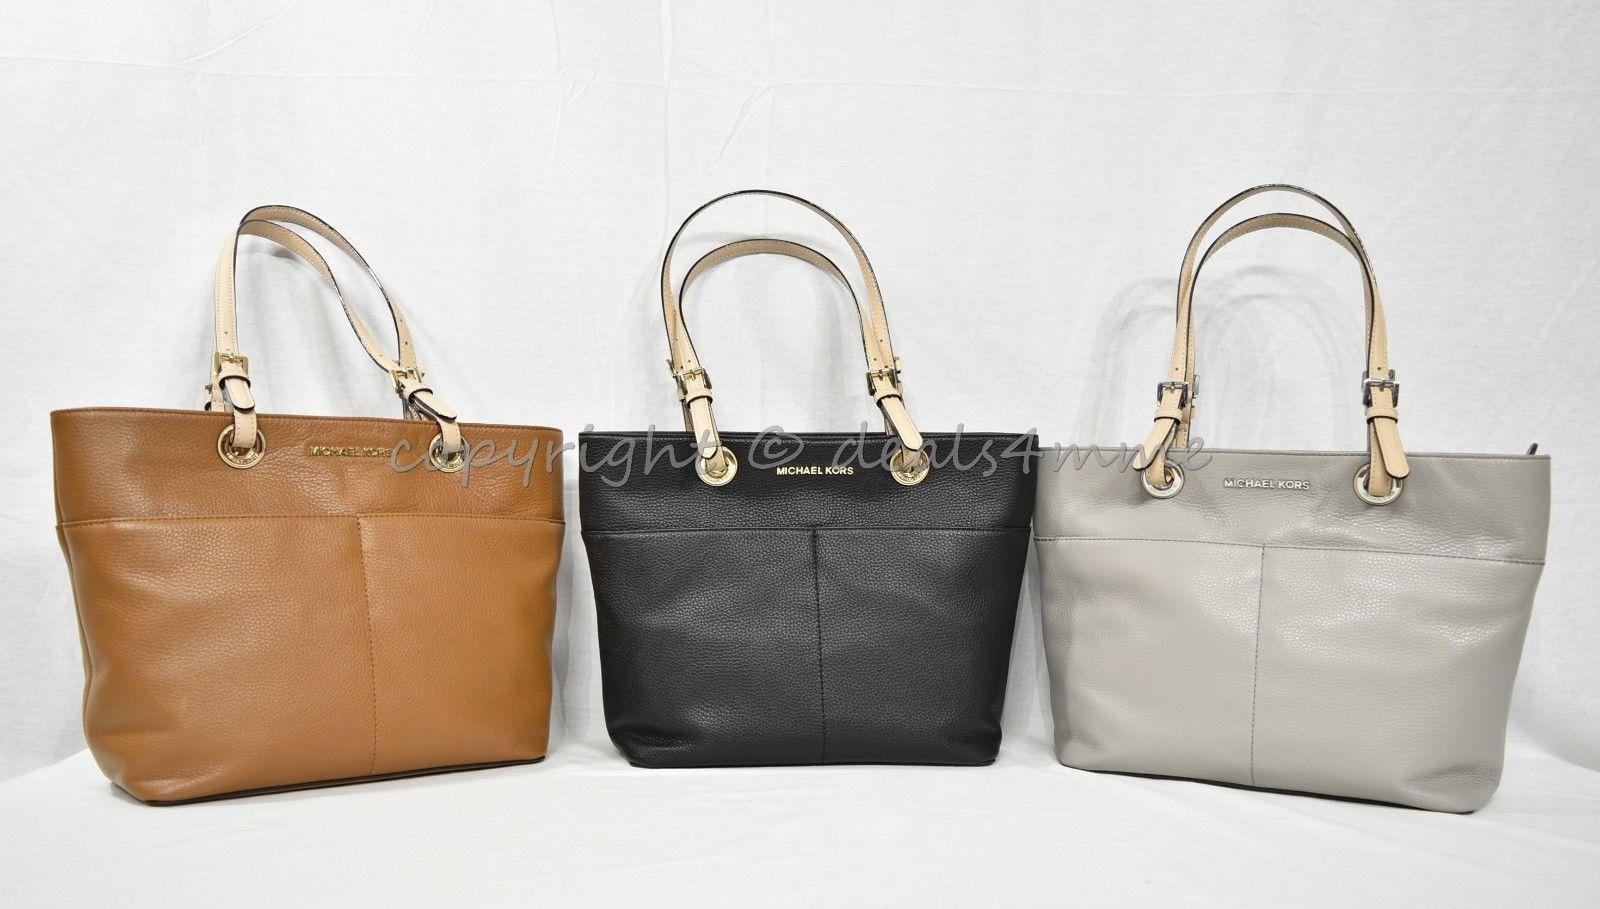 9c926c052b14 Michael Kors Bedford Leather Pocket and 31 similar items. 57